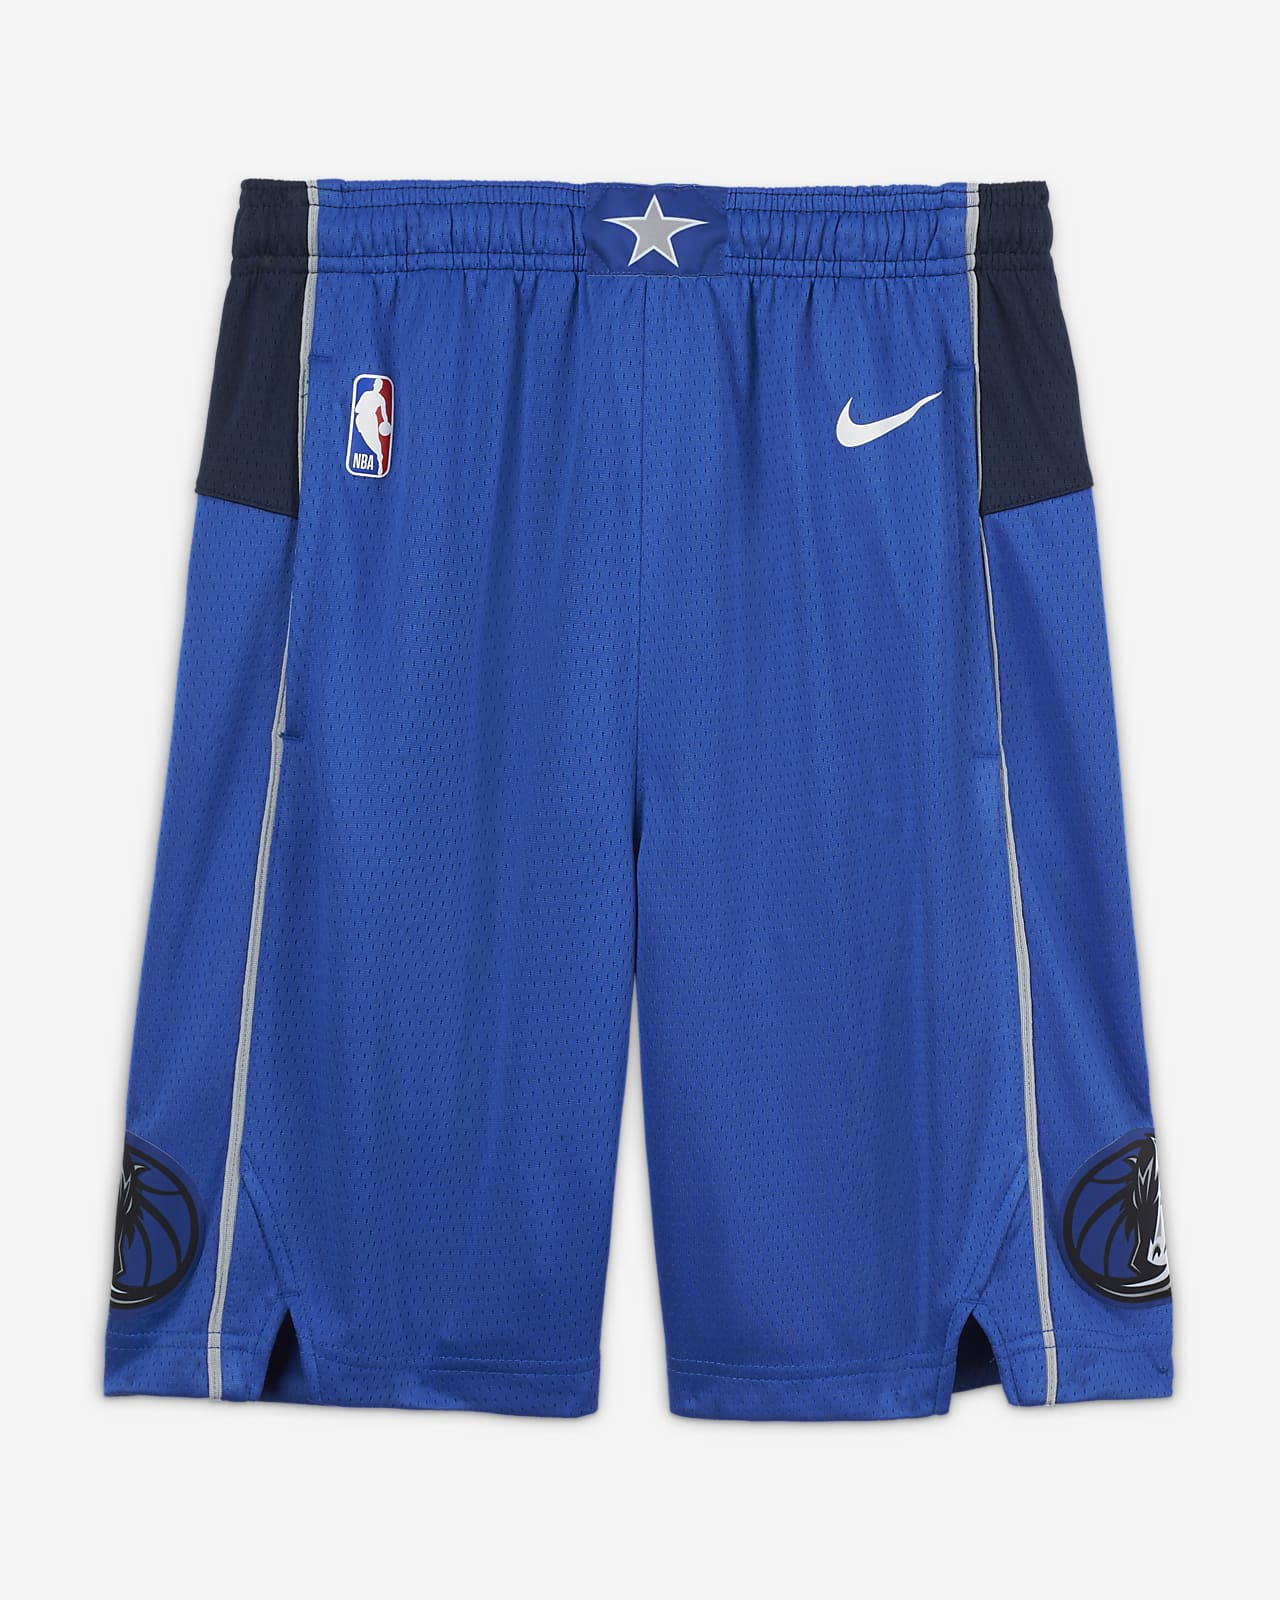 Dallas Mavericks Icon Edition Older Kids' Nike NBA Swingman Shorts